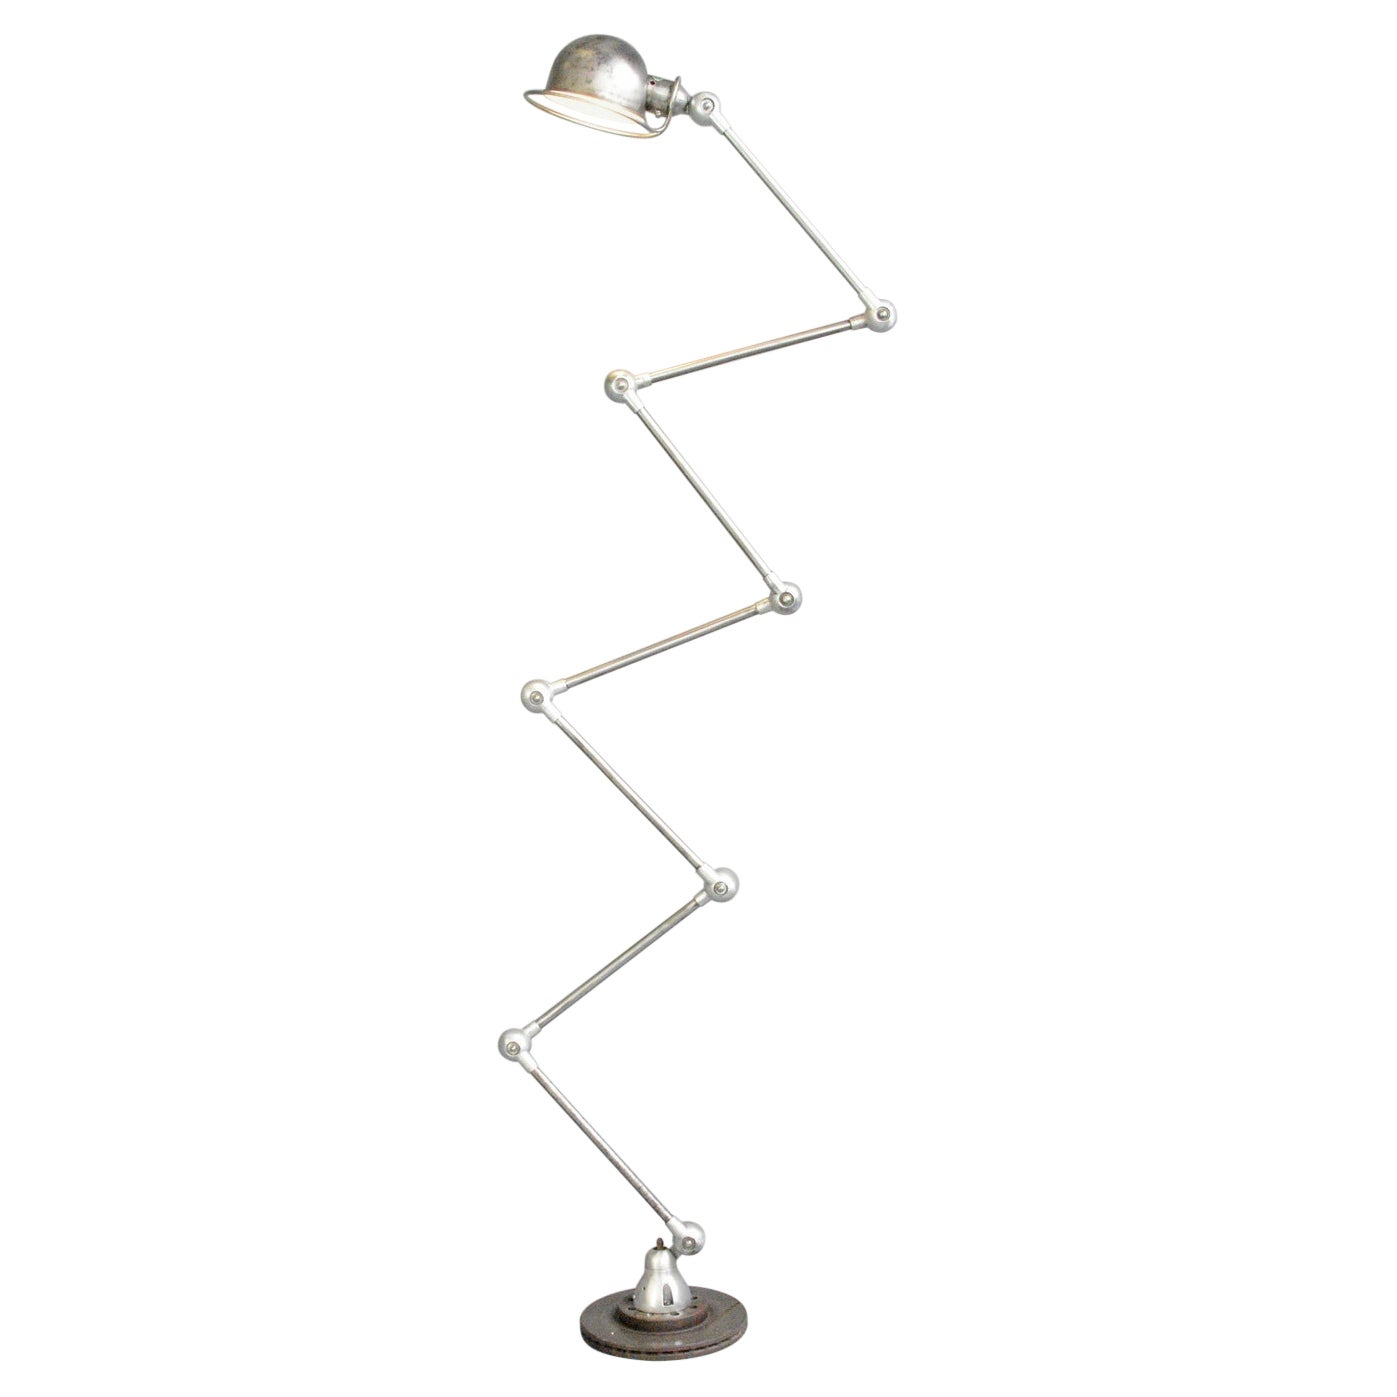 Large 7 Arm Floor Standing Jielde Lamp Circa 1950s